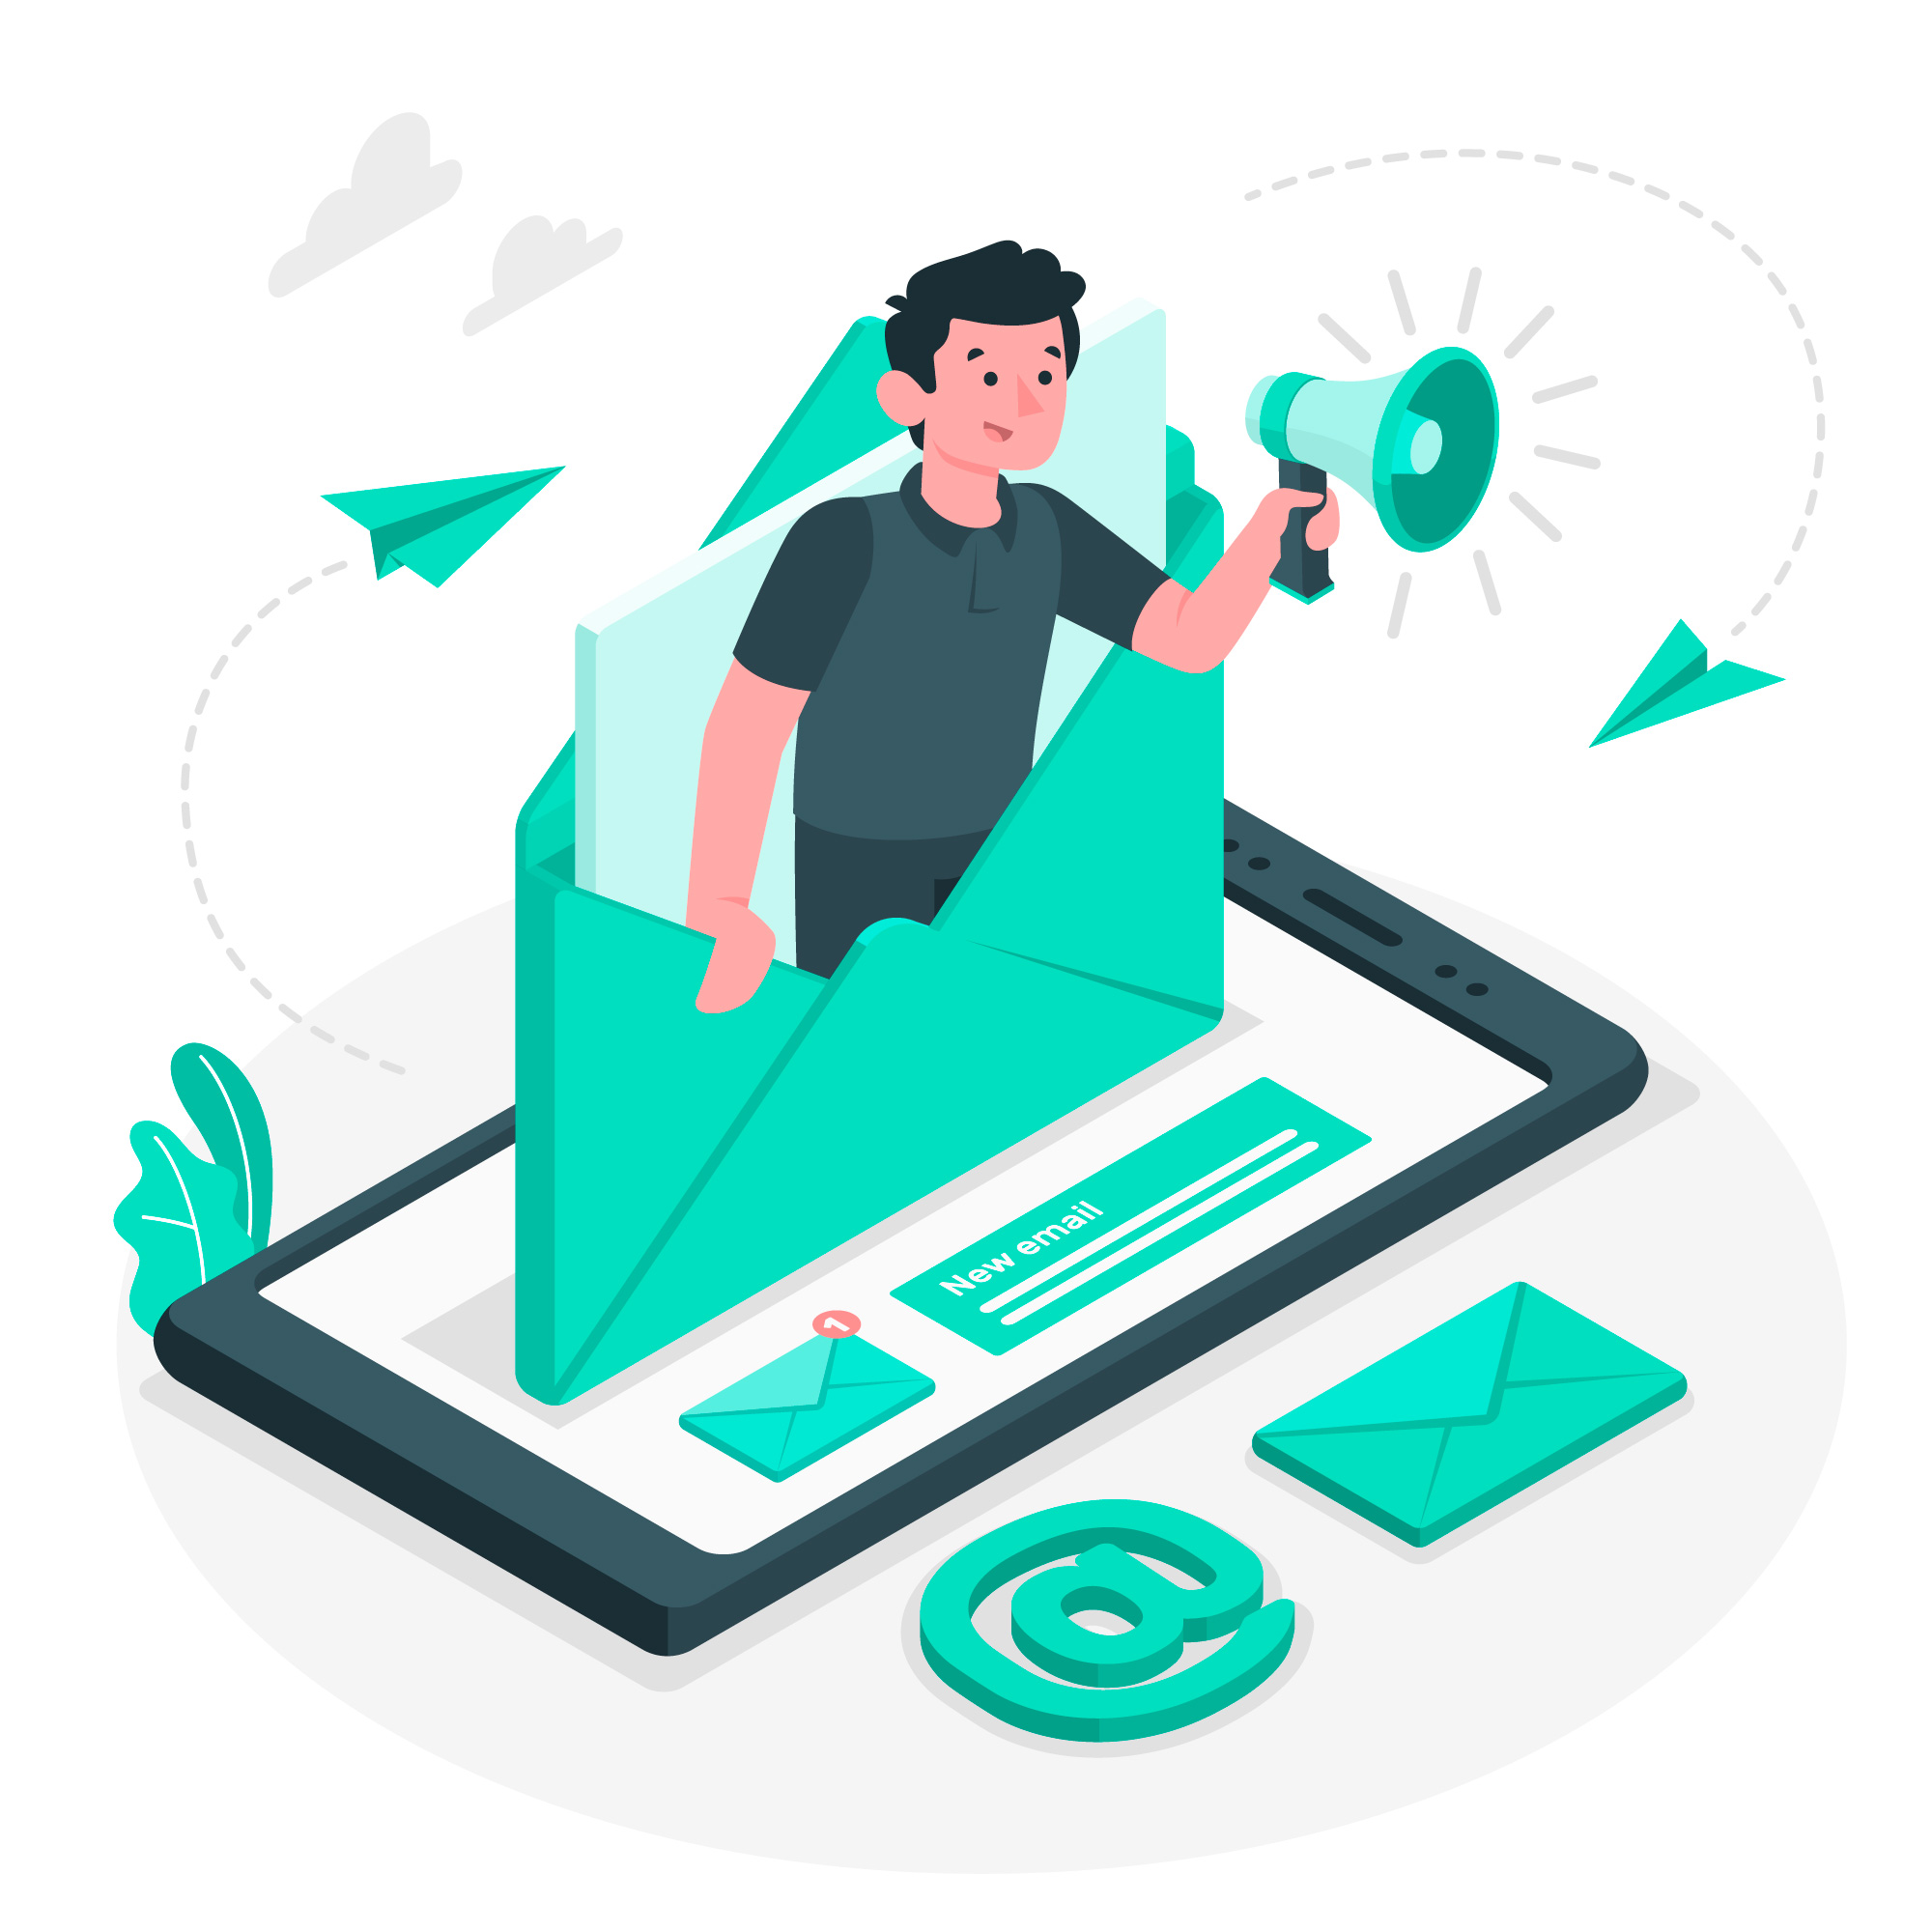 E-Mail Marketing - 5 Reasons Readers Turn Back